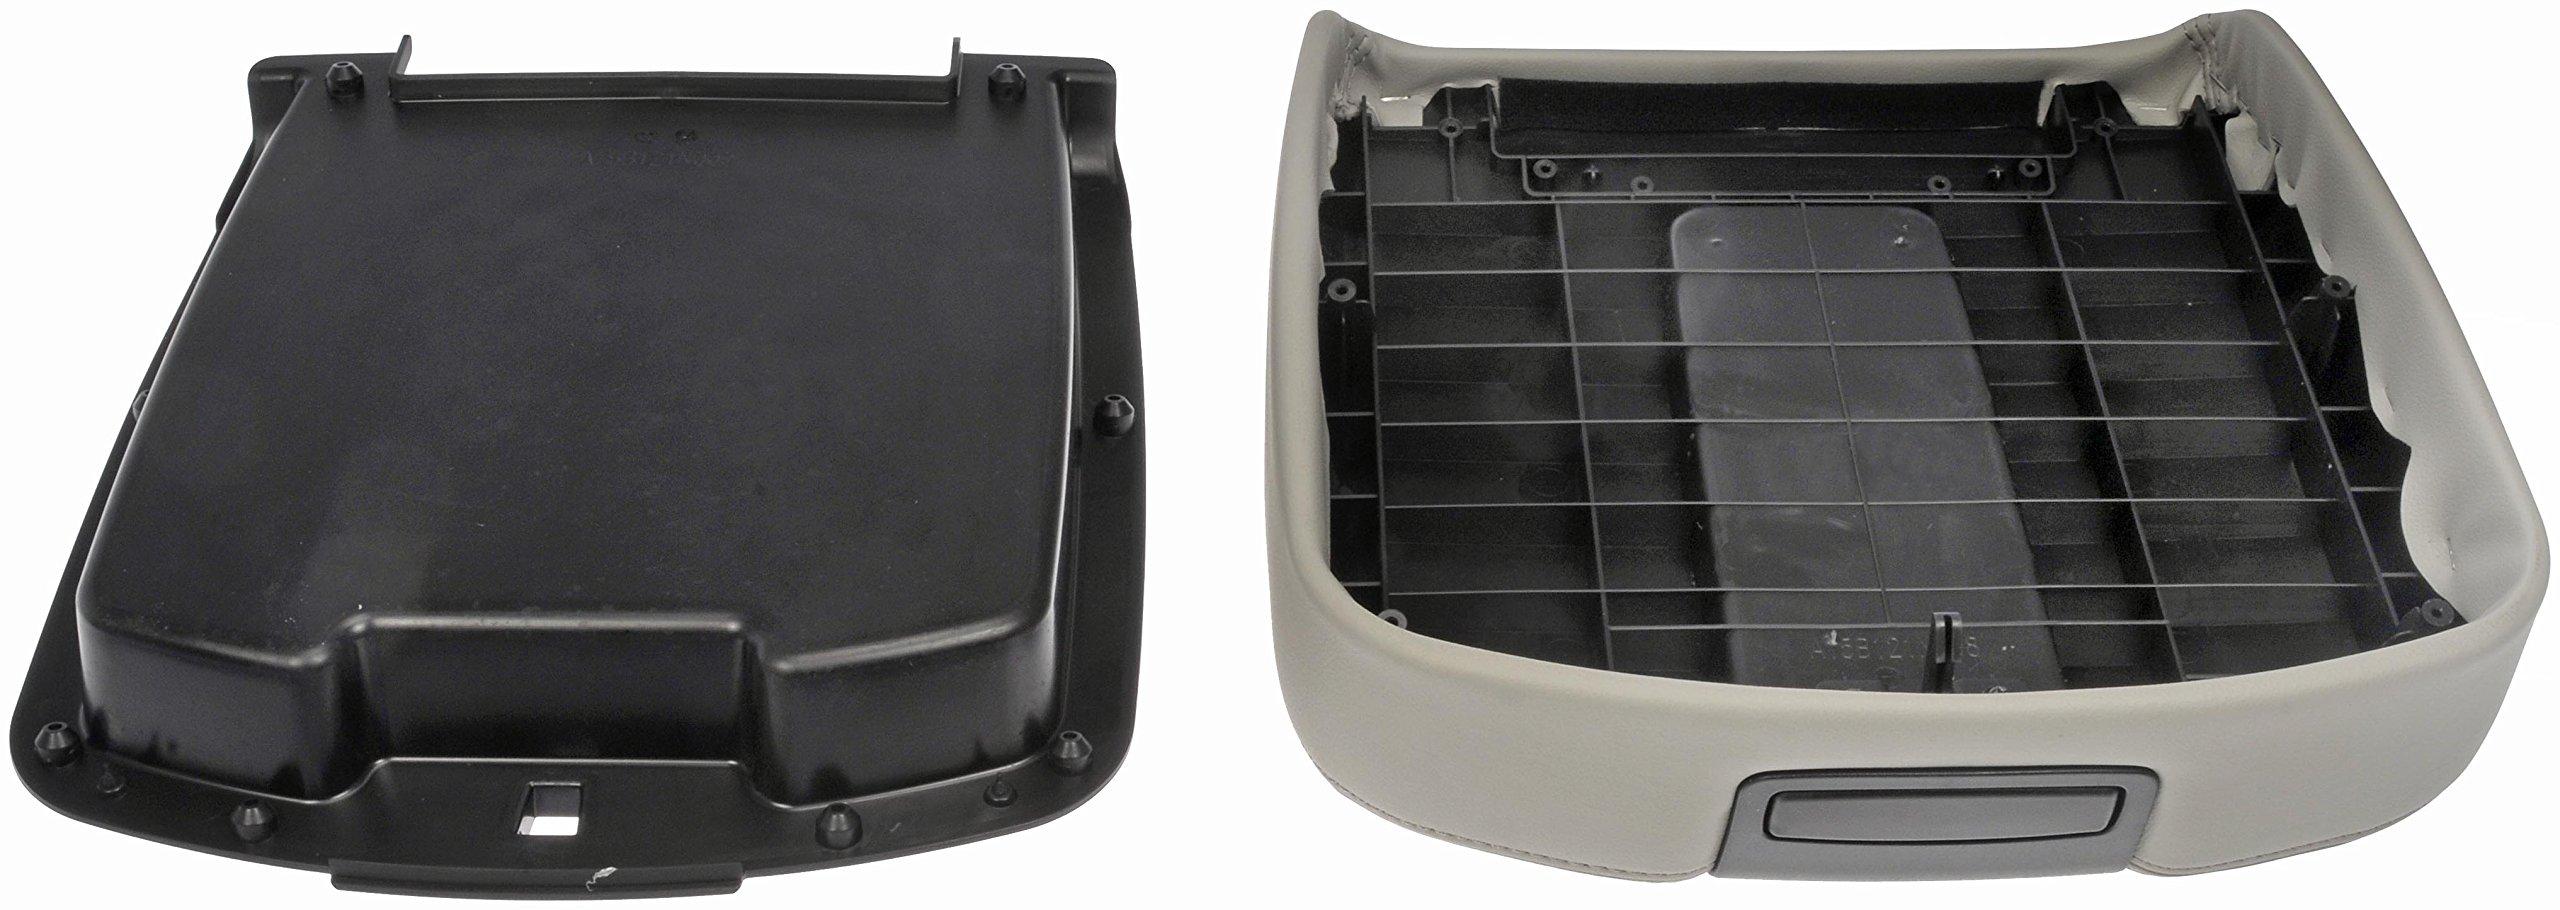 Dorman OE Solutions 924-874 Console Lid Titanium by Dorman (Image #2)